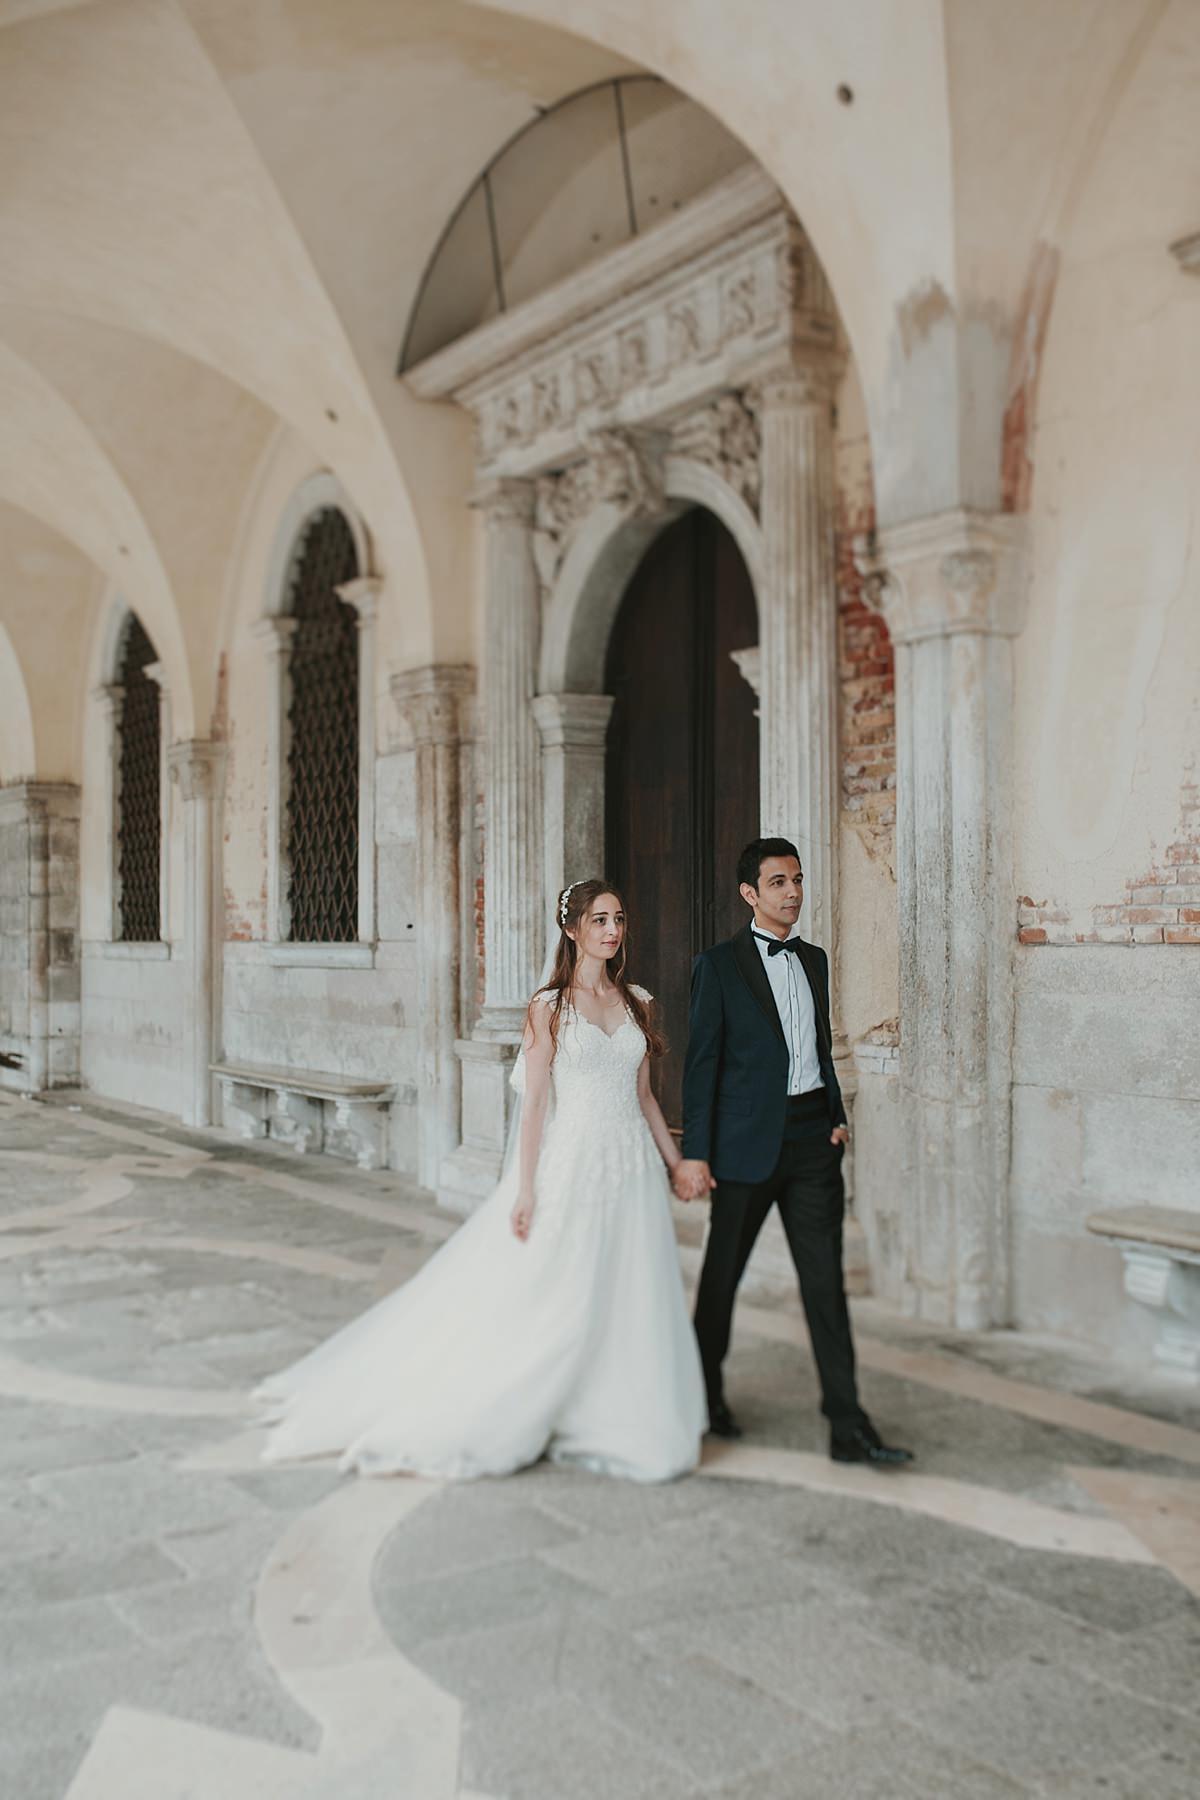 romantica-luna-di-miele-a-venezia_0016